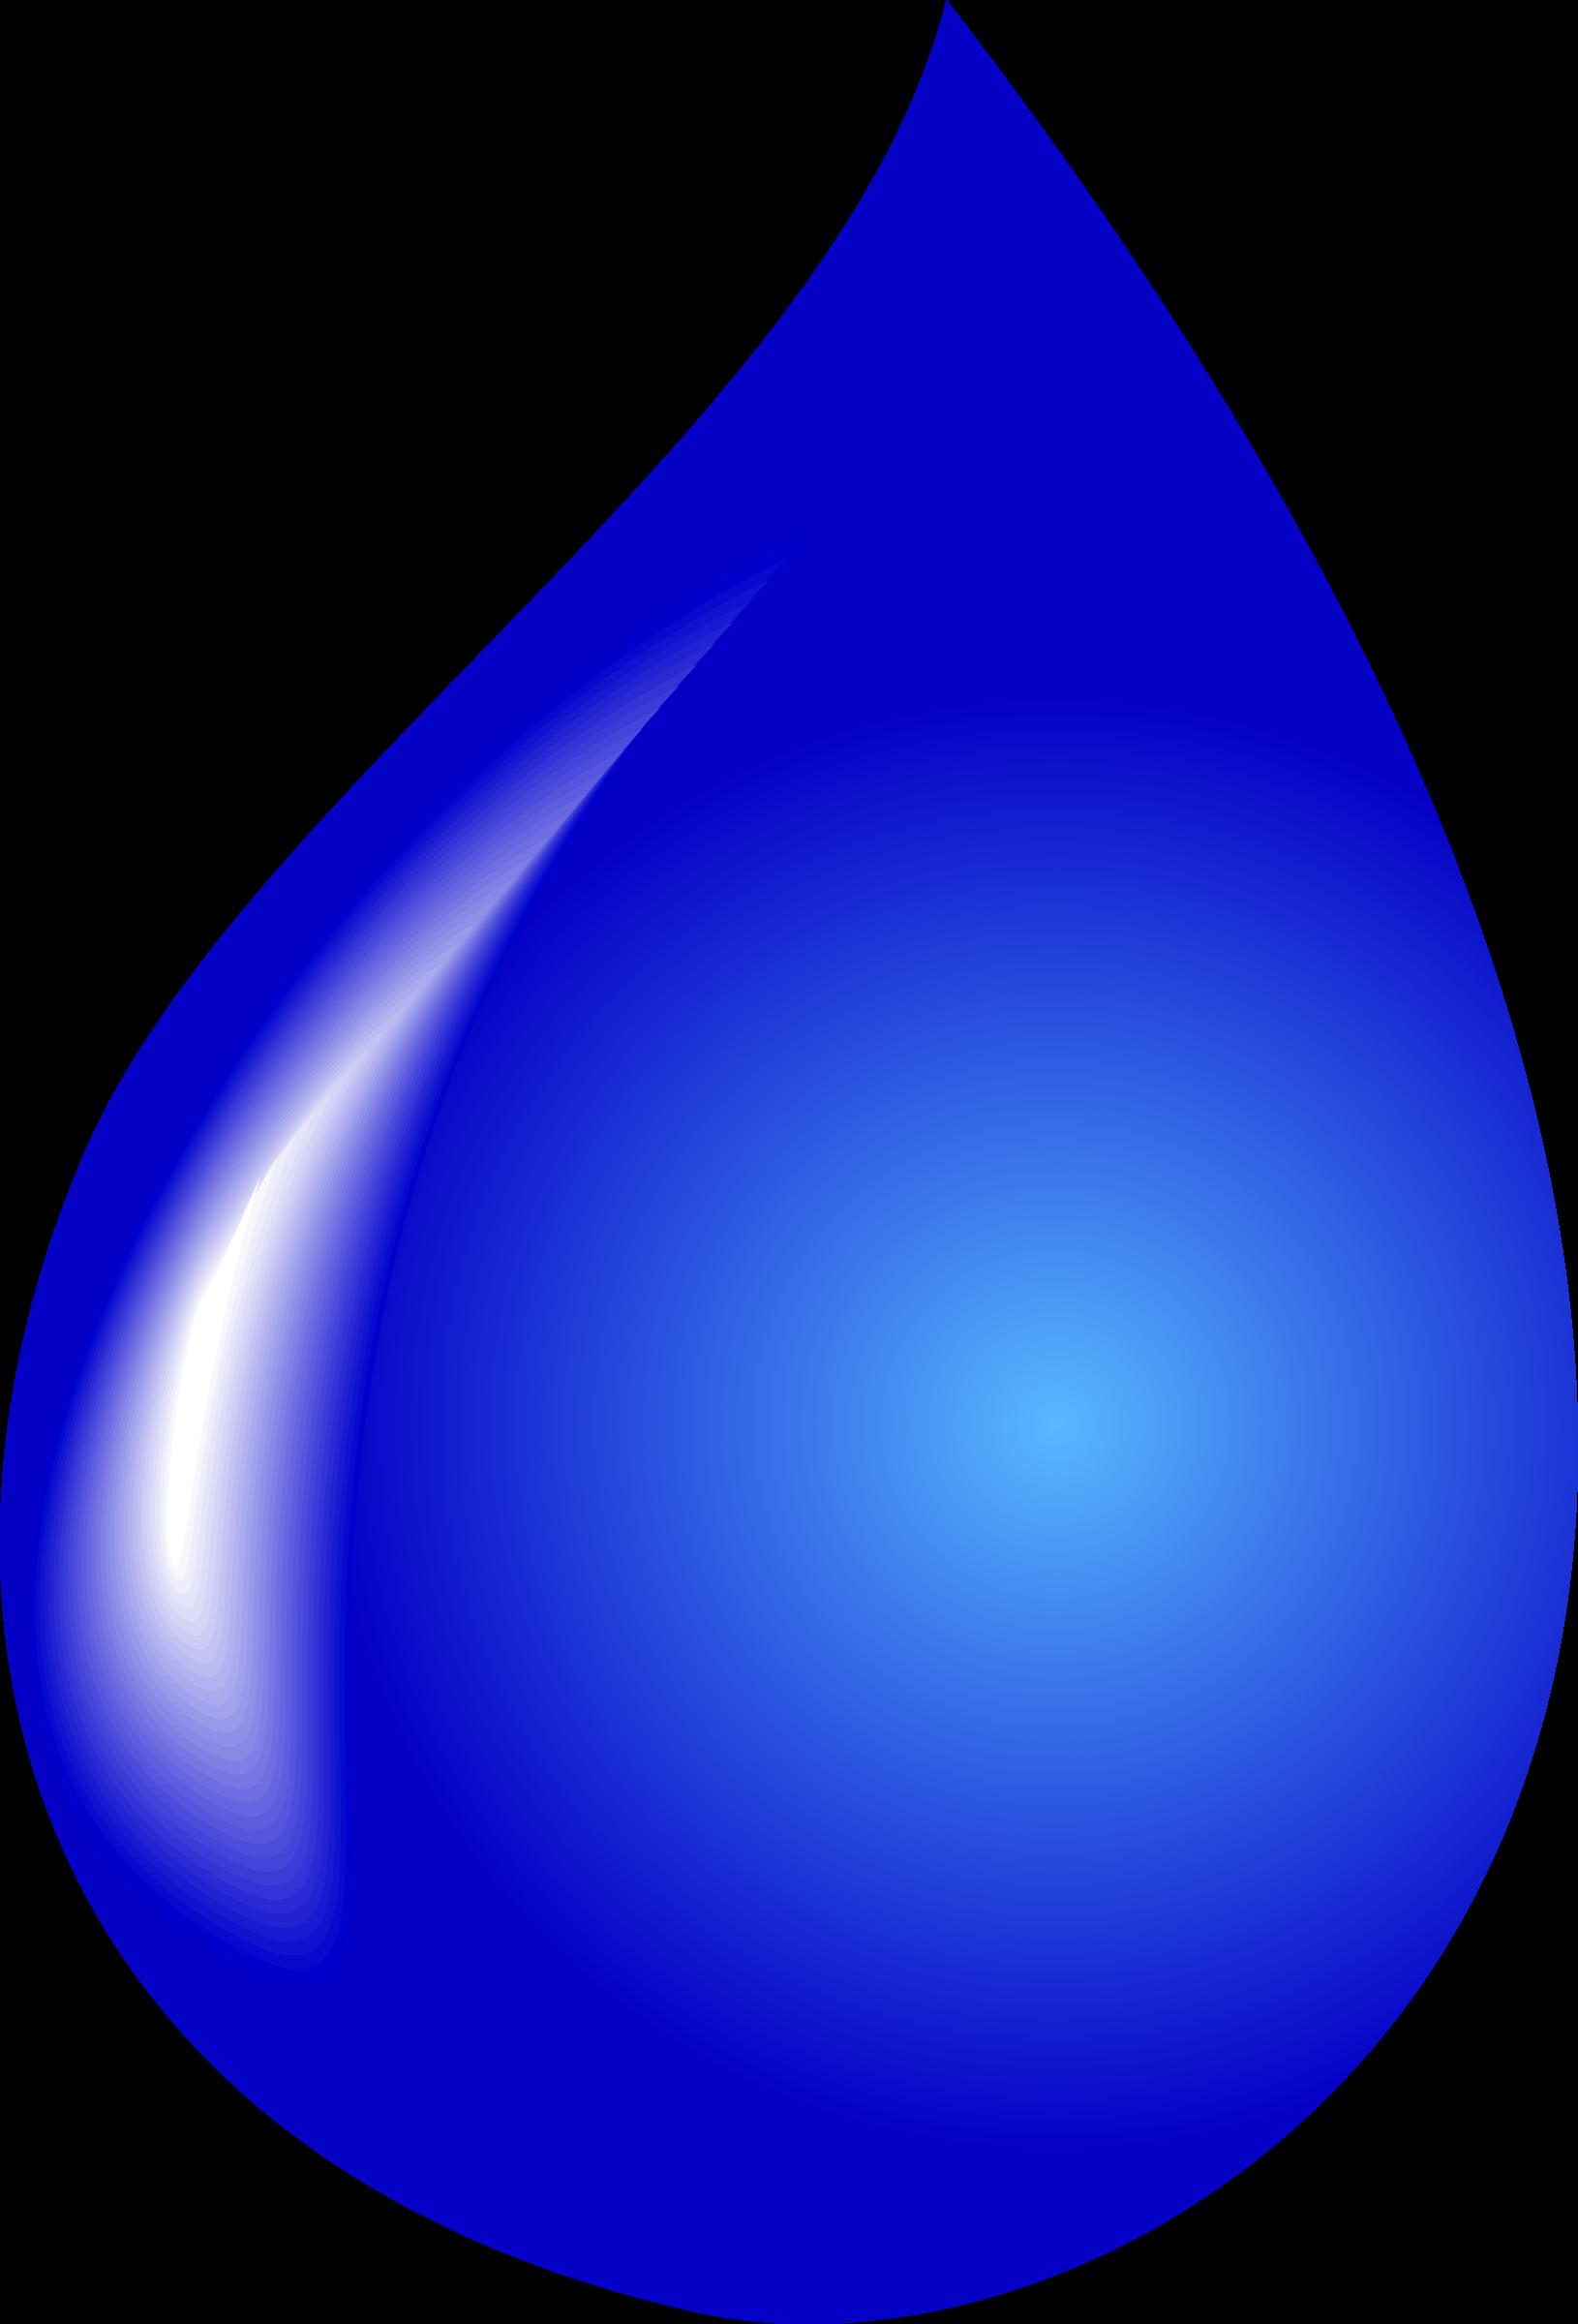 Drop scalable vector graphics. Splash clipart raindrop splash